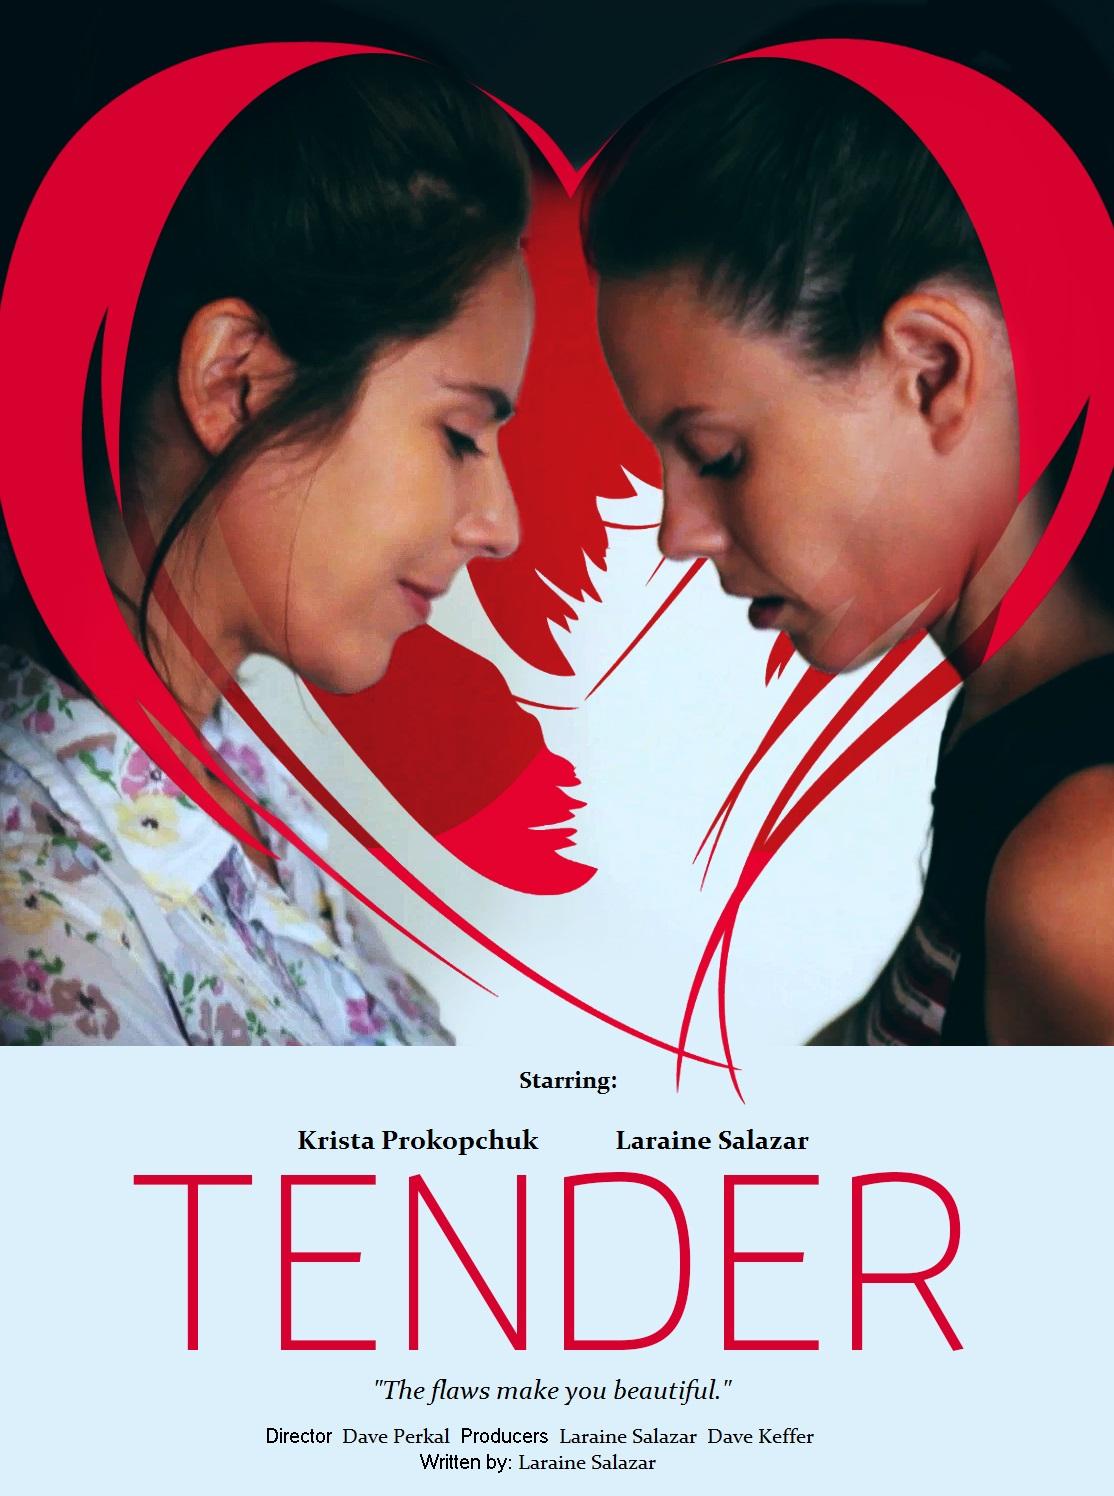 tender_poster_image (3)